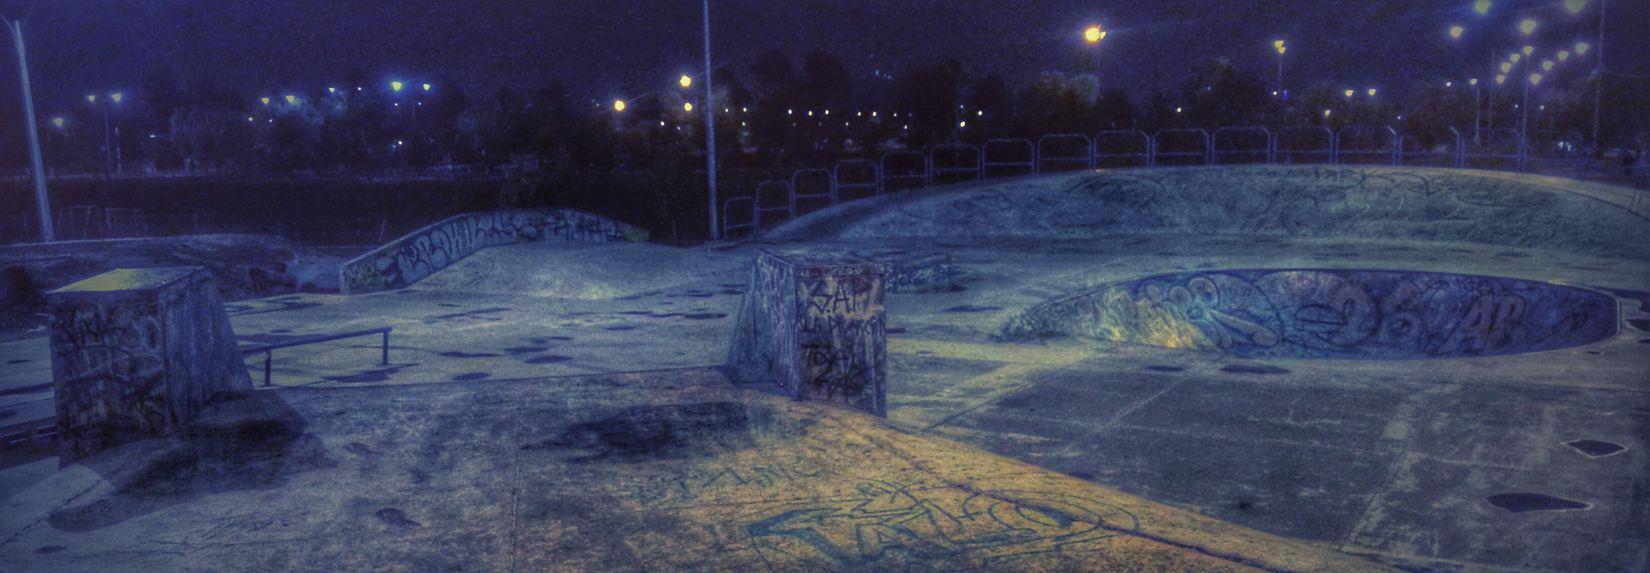 Skatepark Skateboard Loprado Underground